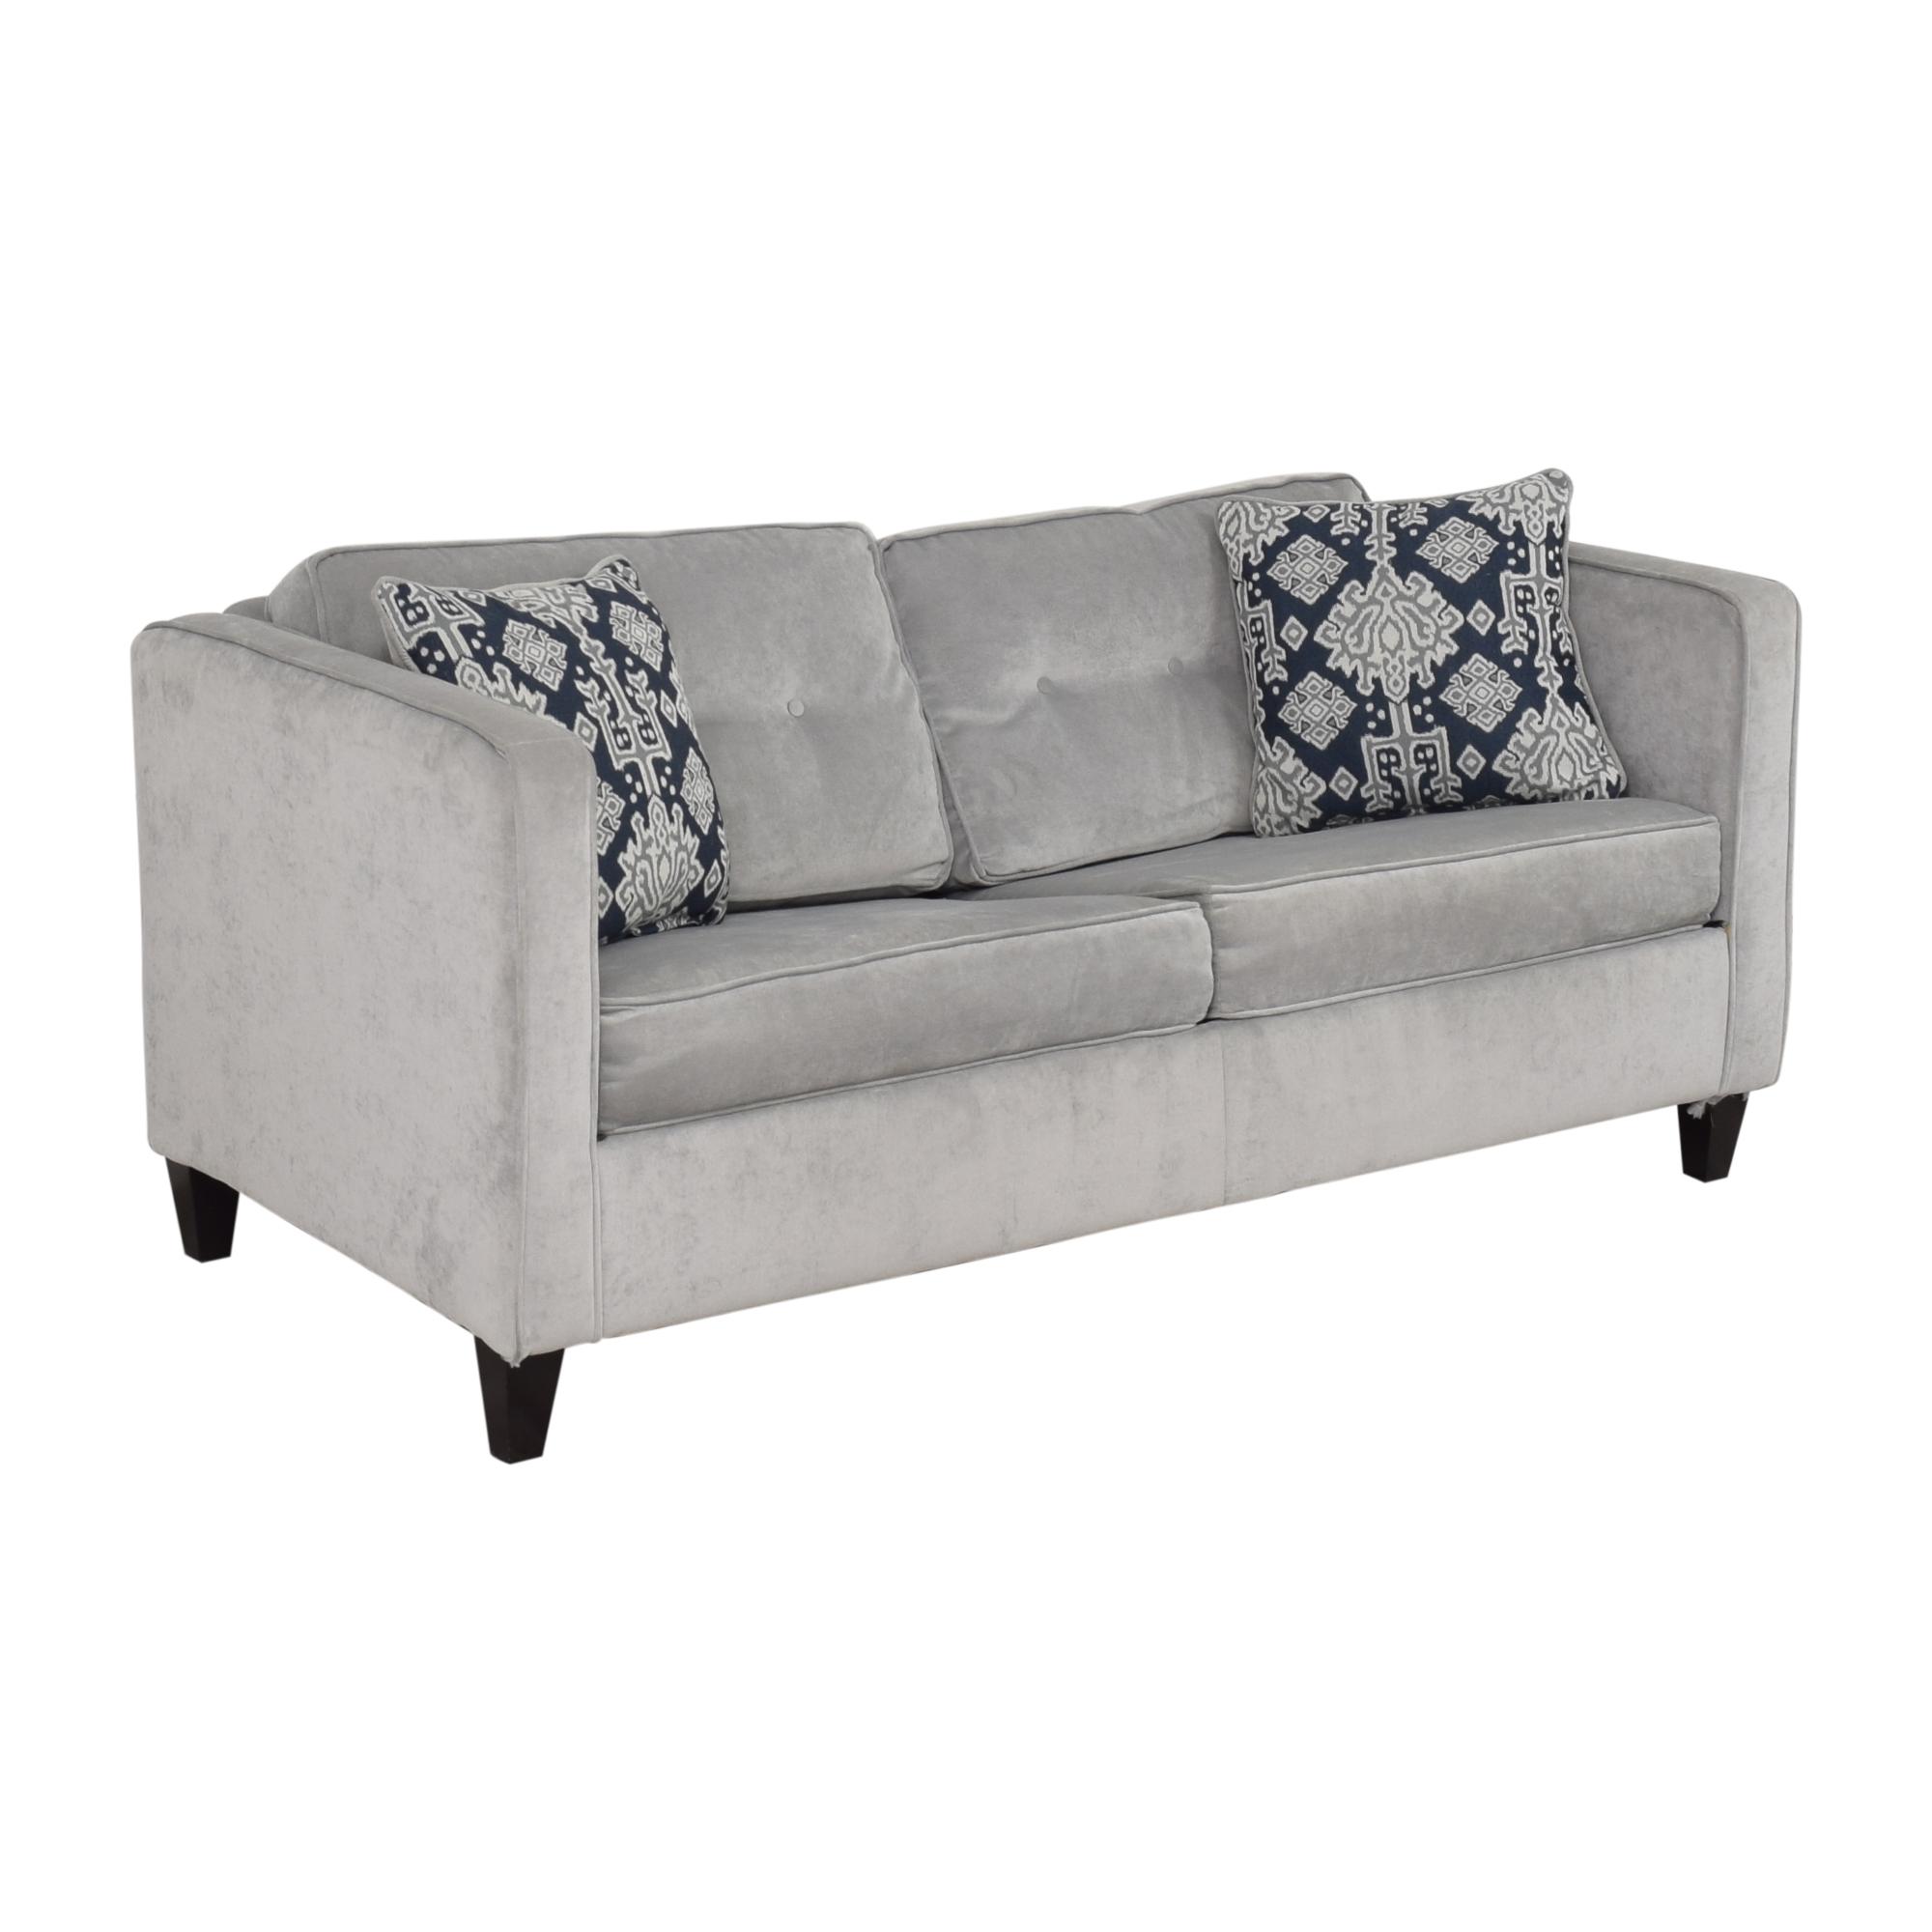 buy Wayfair Ebern Designs Dengler Square Arm Sleeper Sofa Wayfair